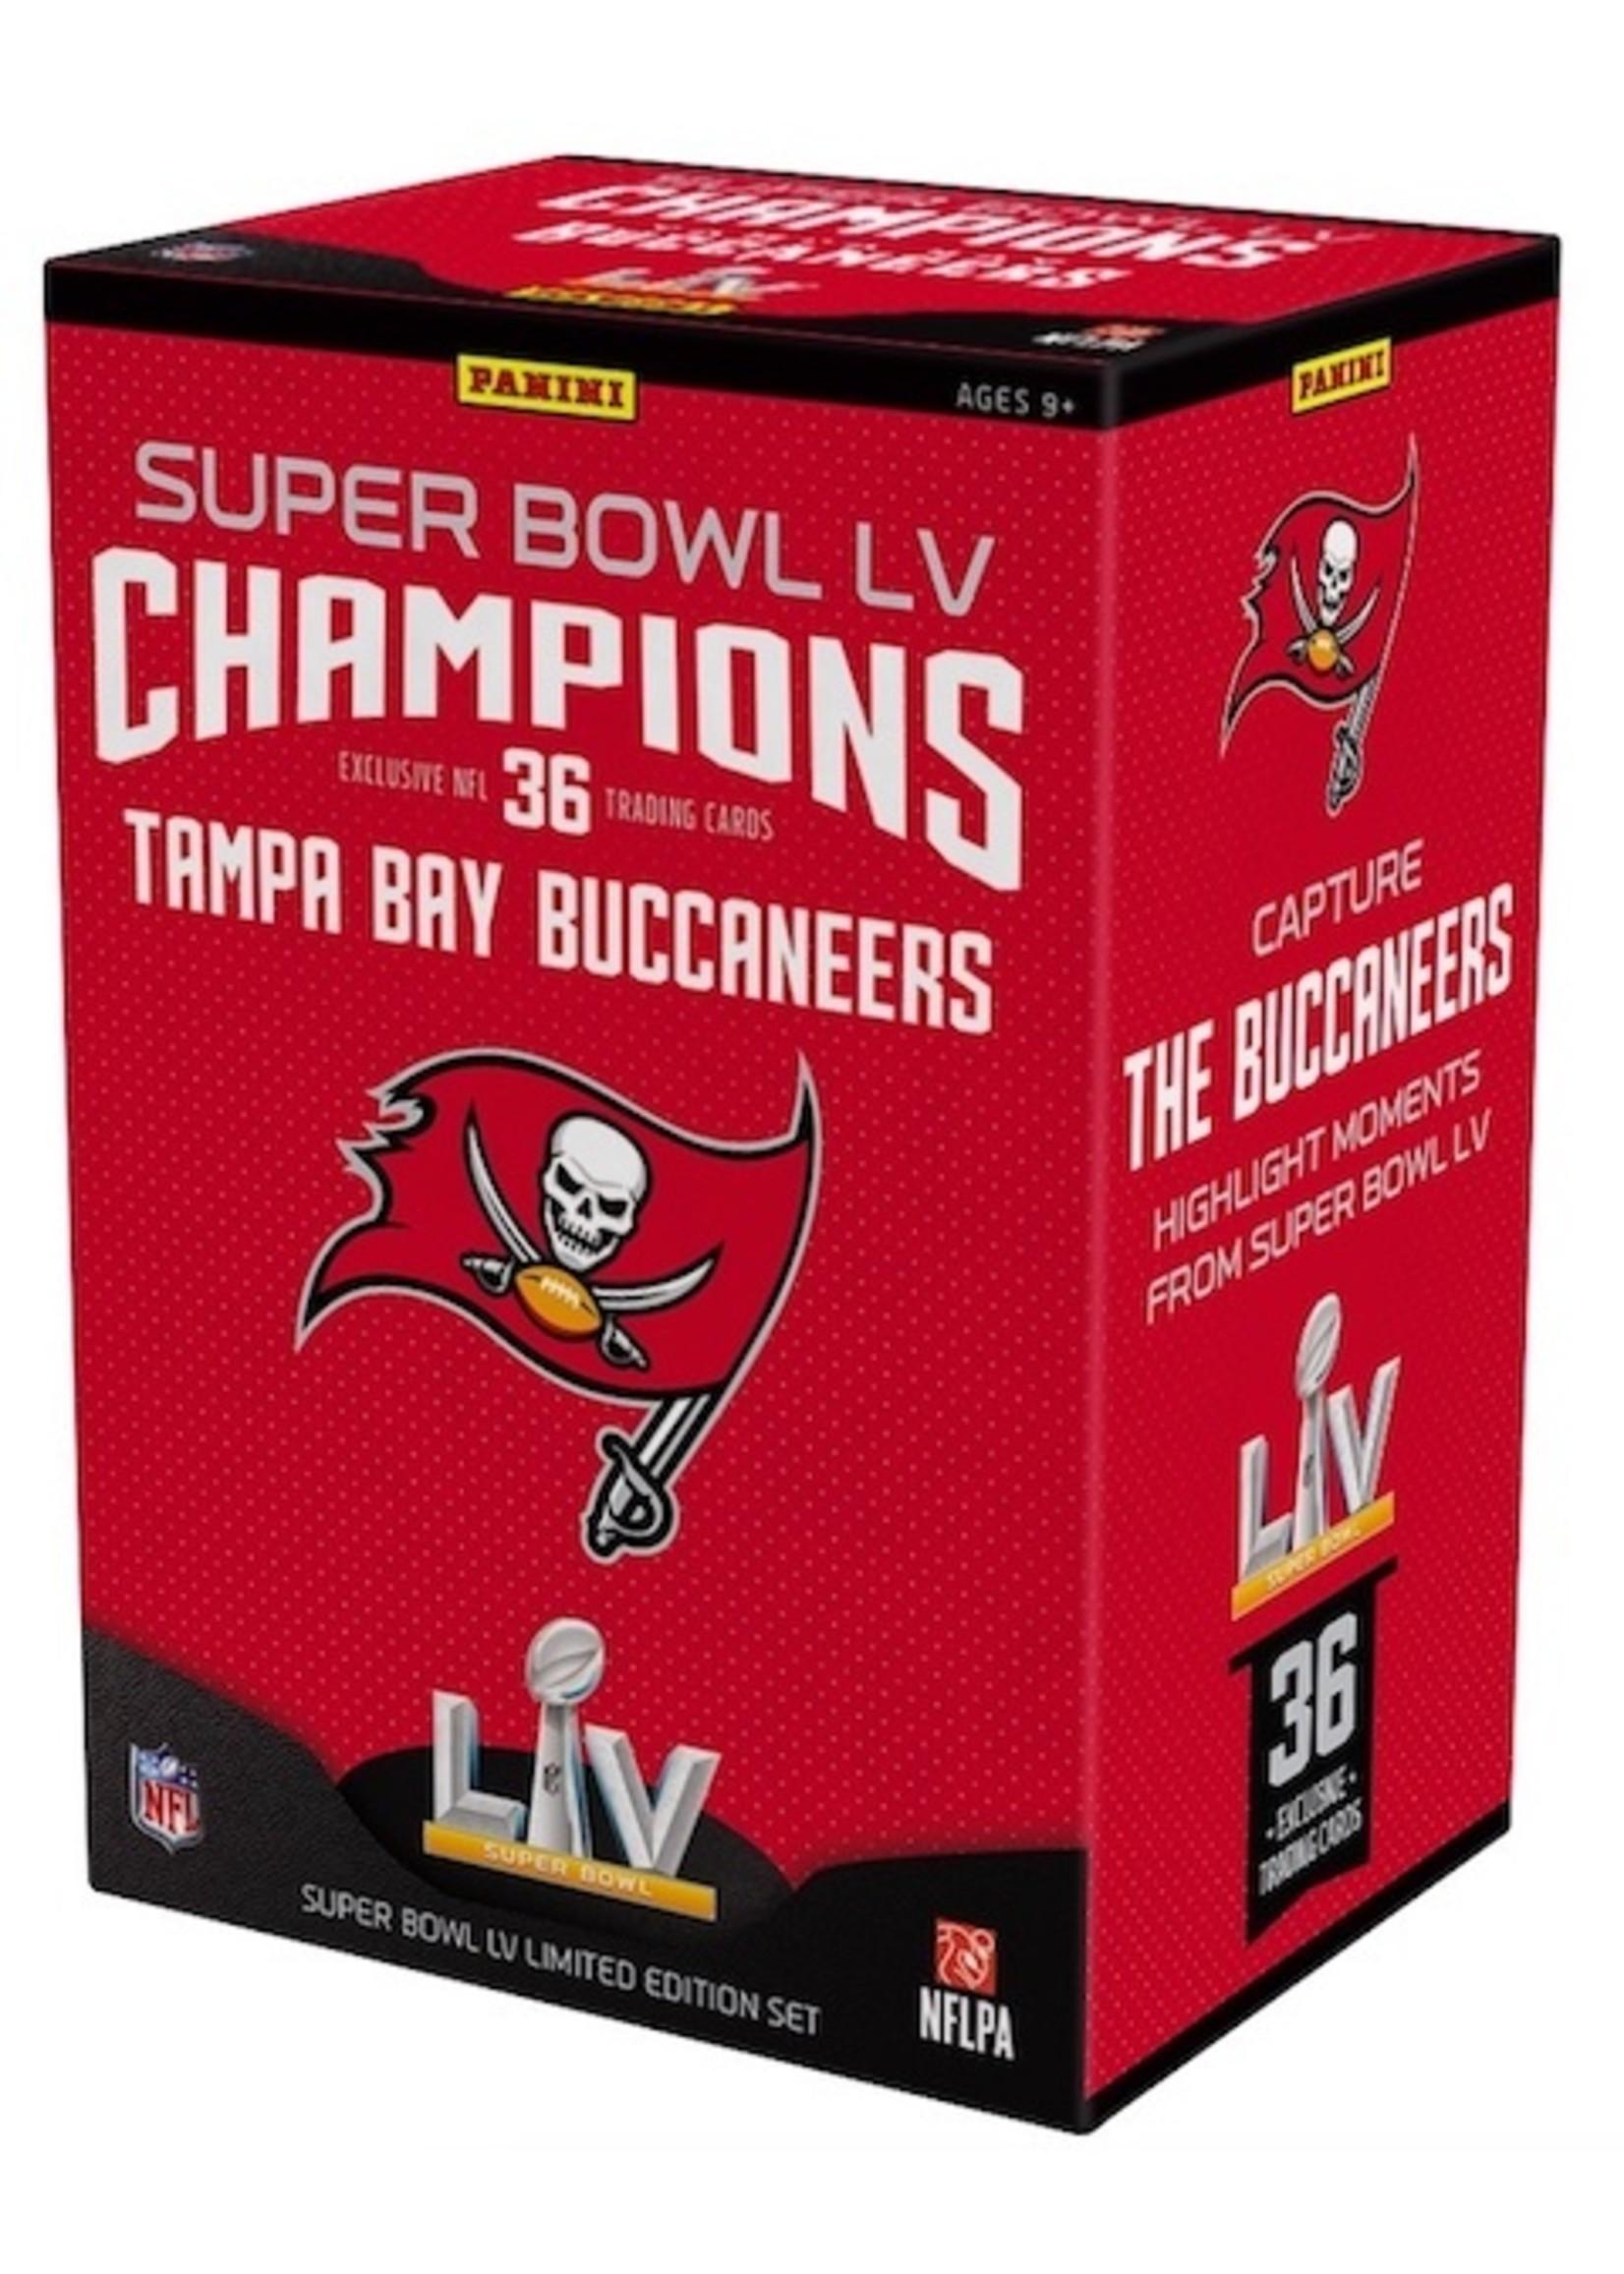 Panini Super Bowl LV champions blaster box